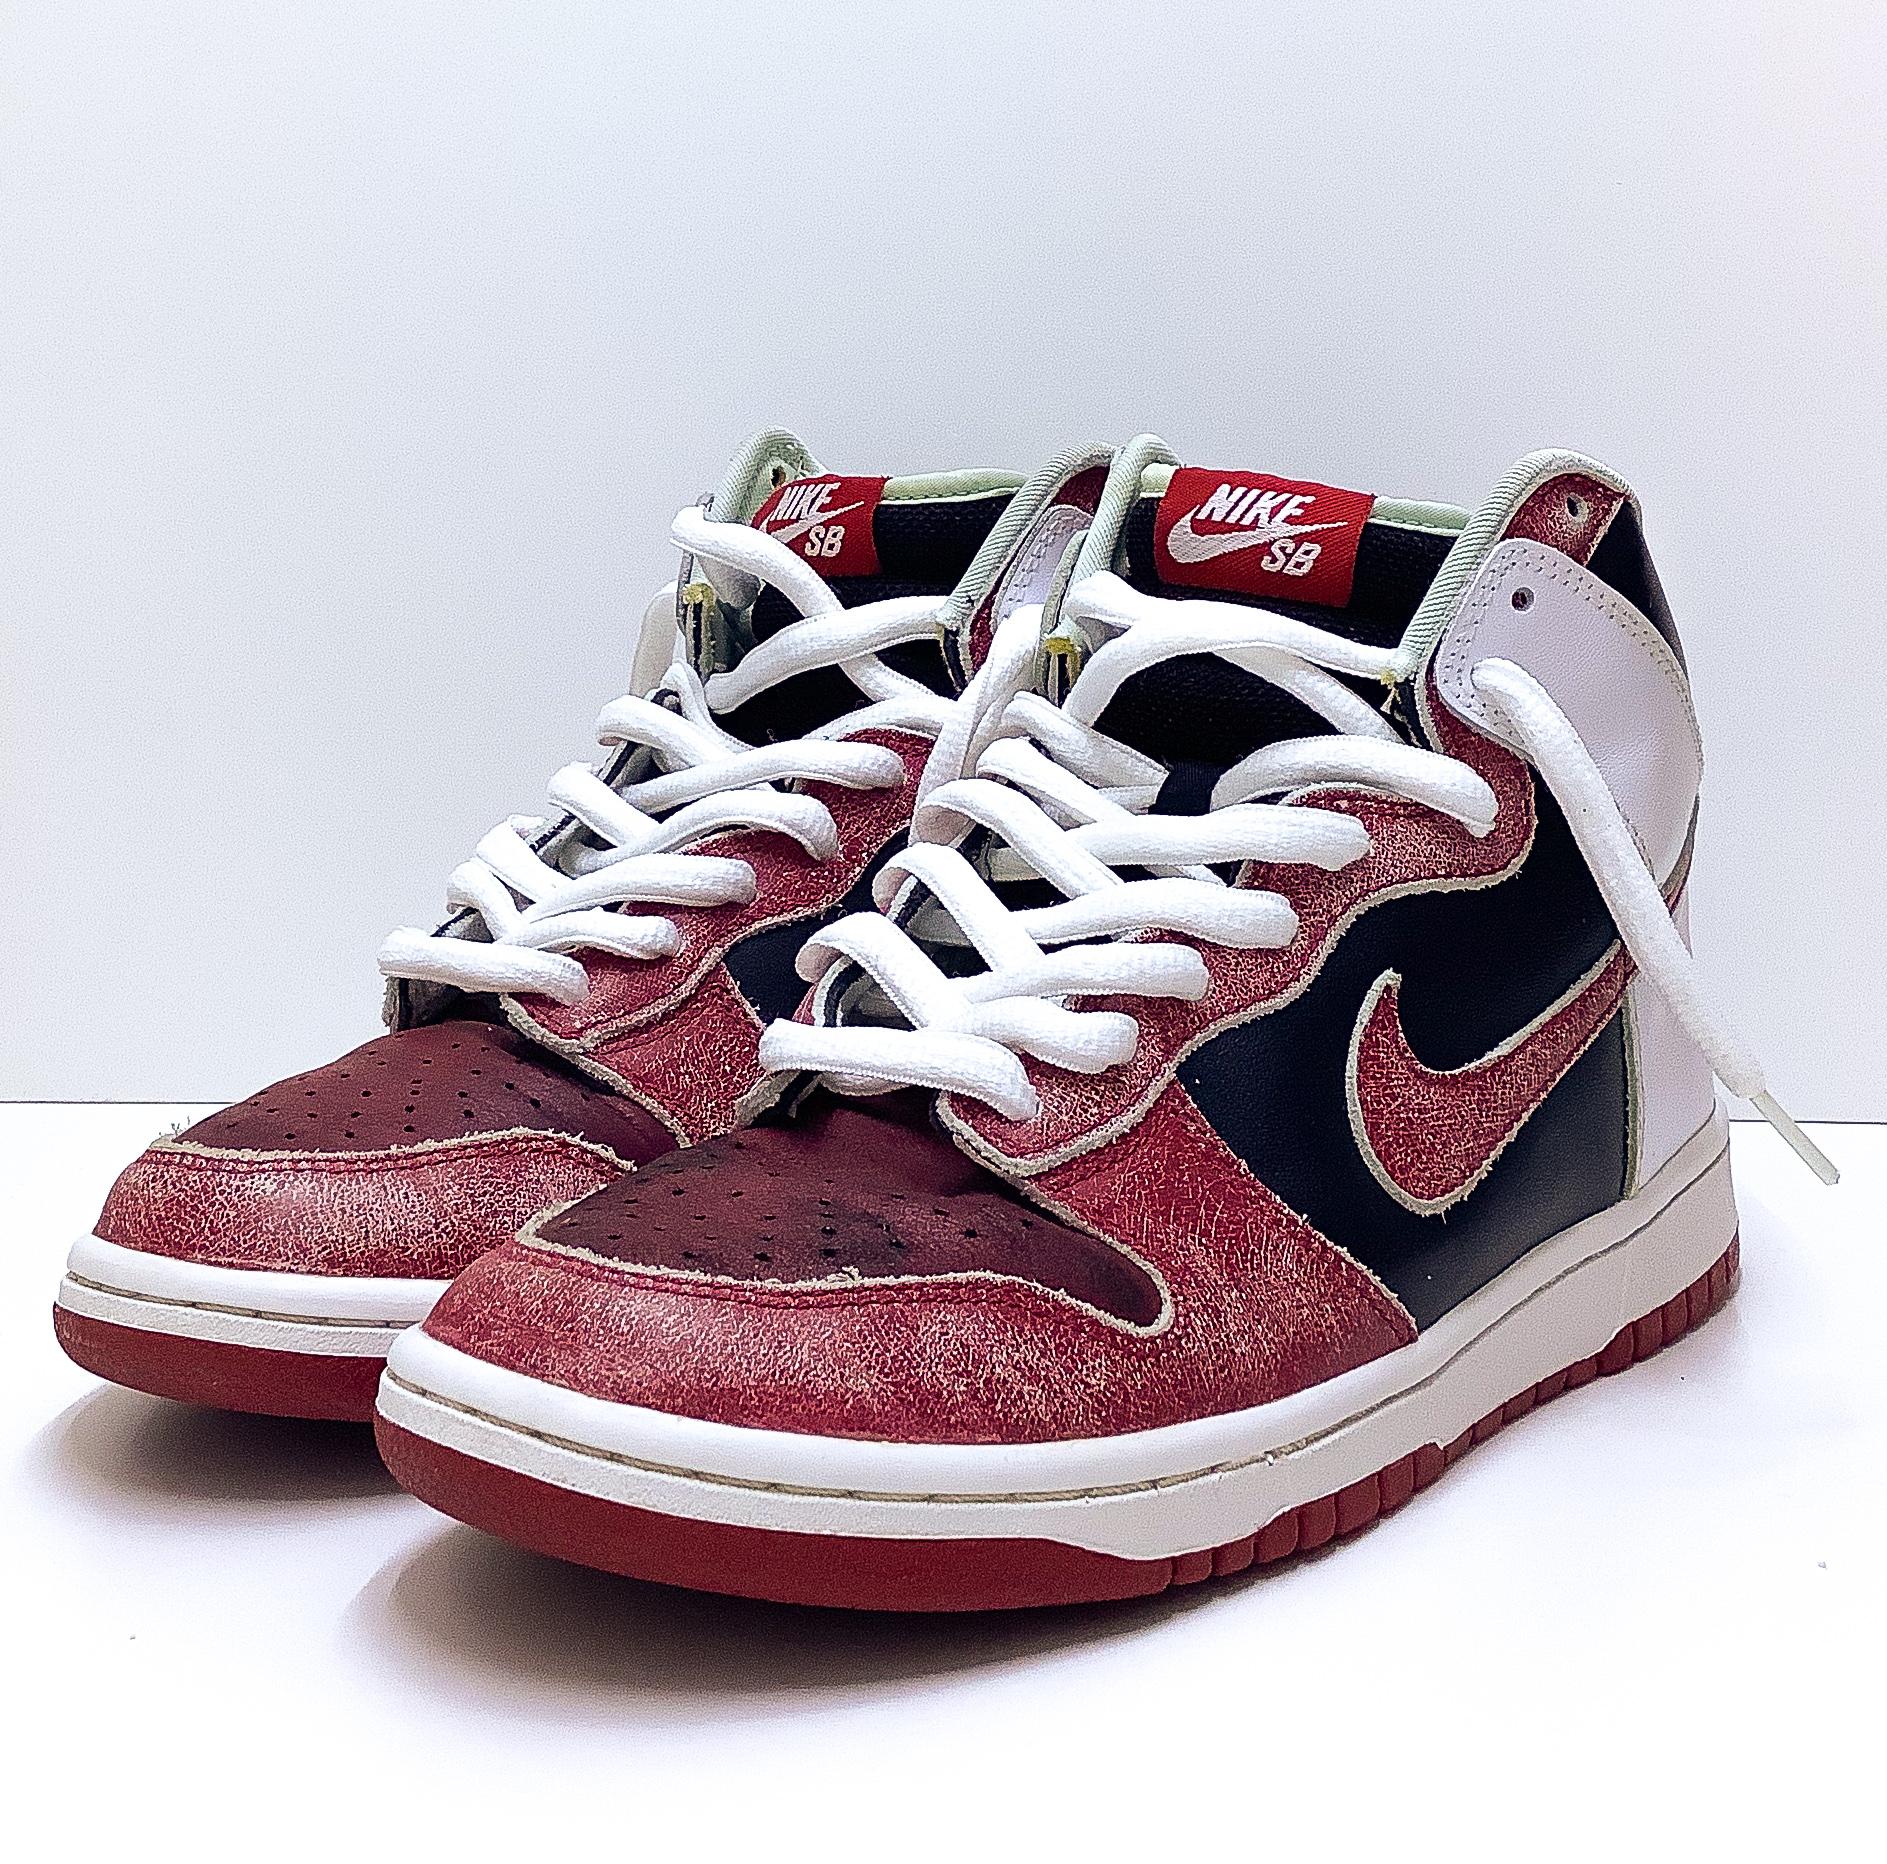 Nike Dunk SB High Jason Voorhees